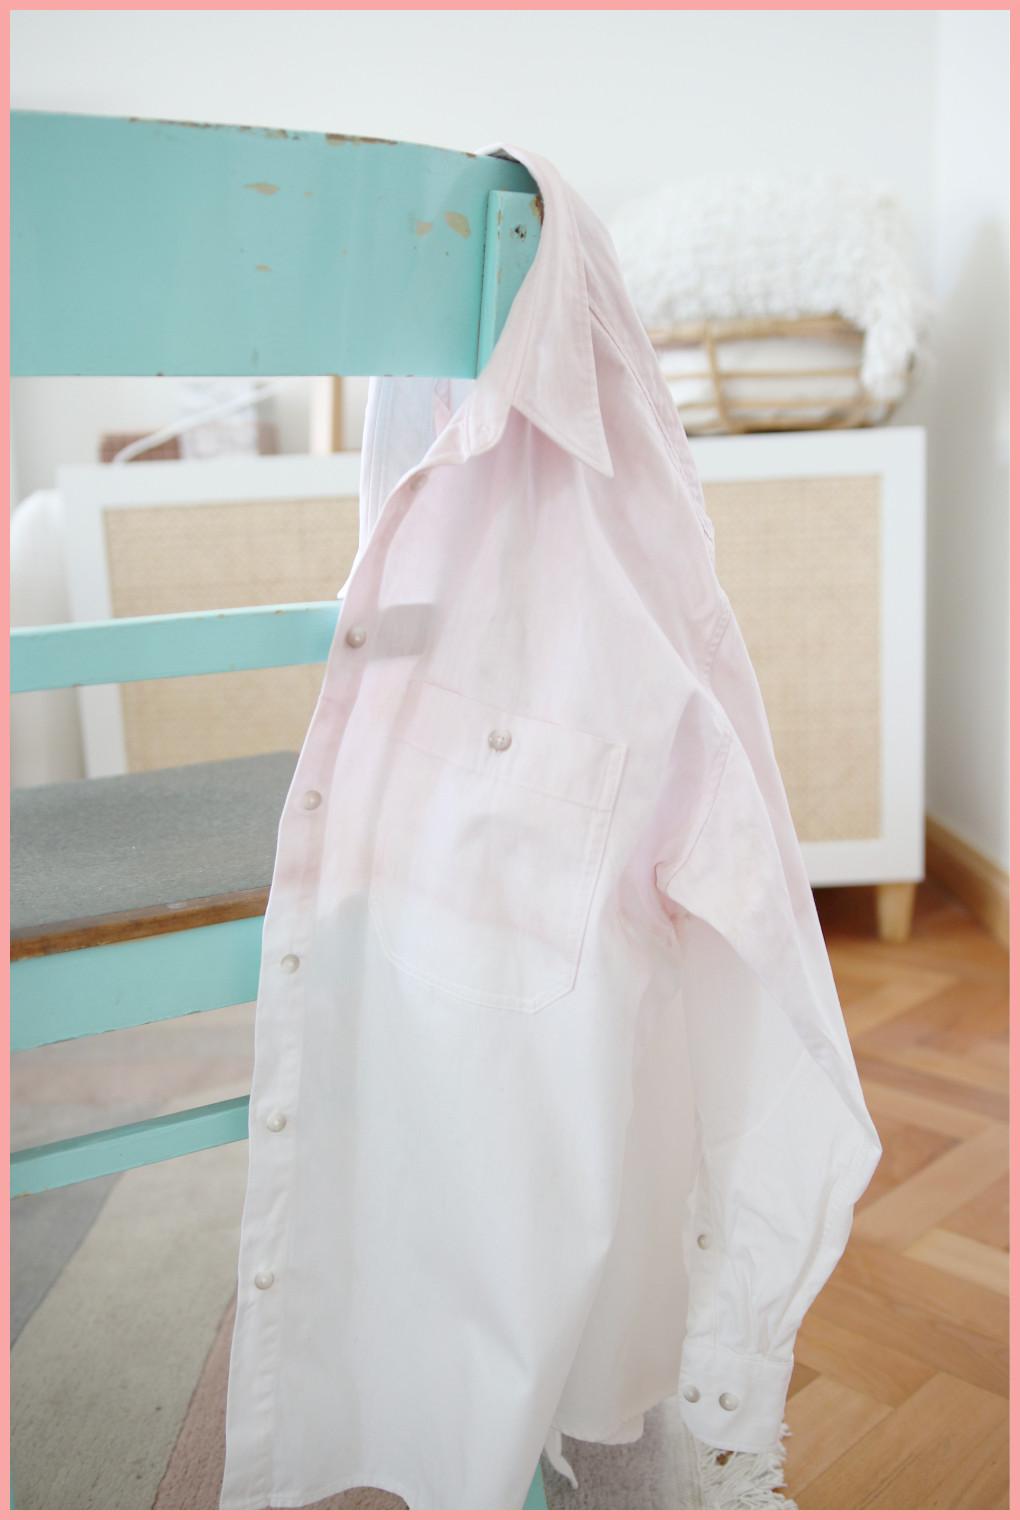 Batik färben mit frau friemel - Dip Dye Ergebnis